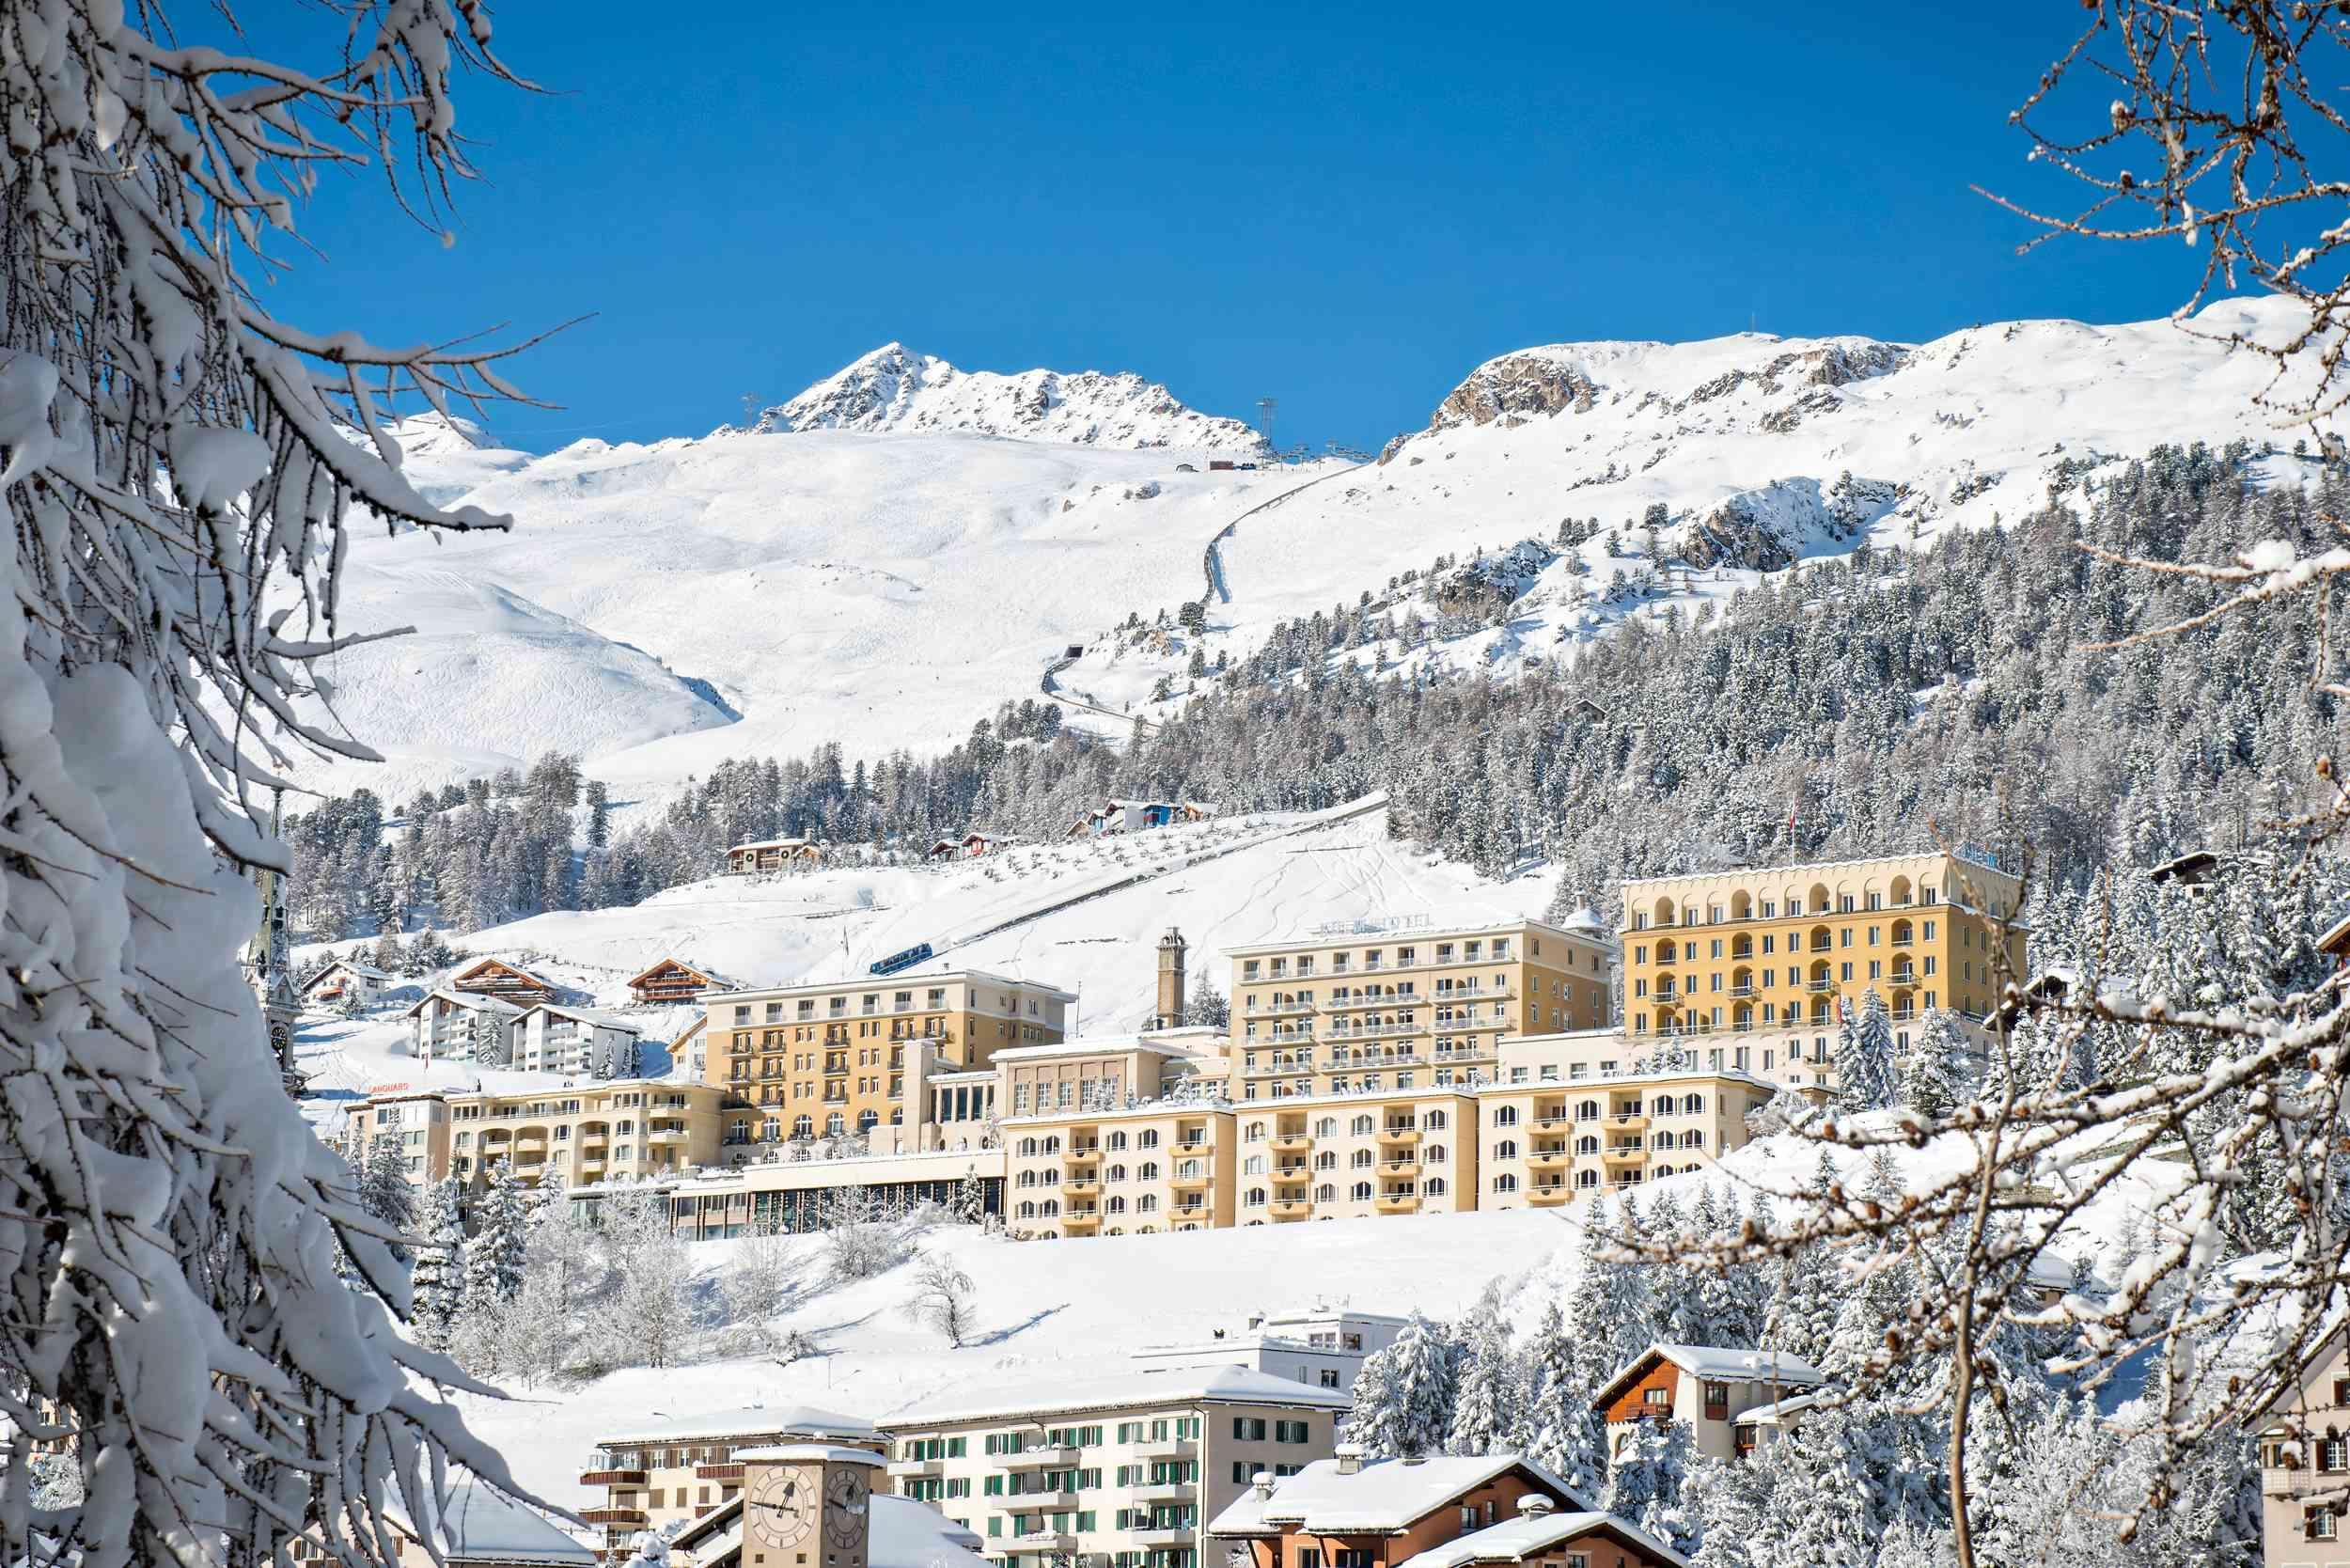 Kulm Hotel winter